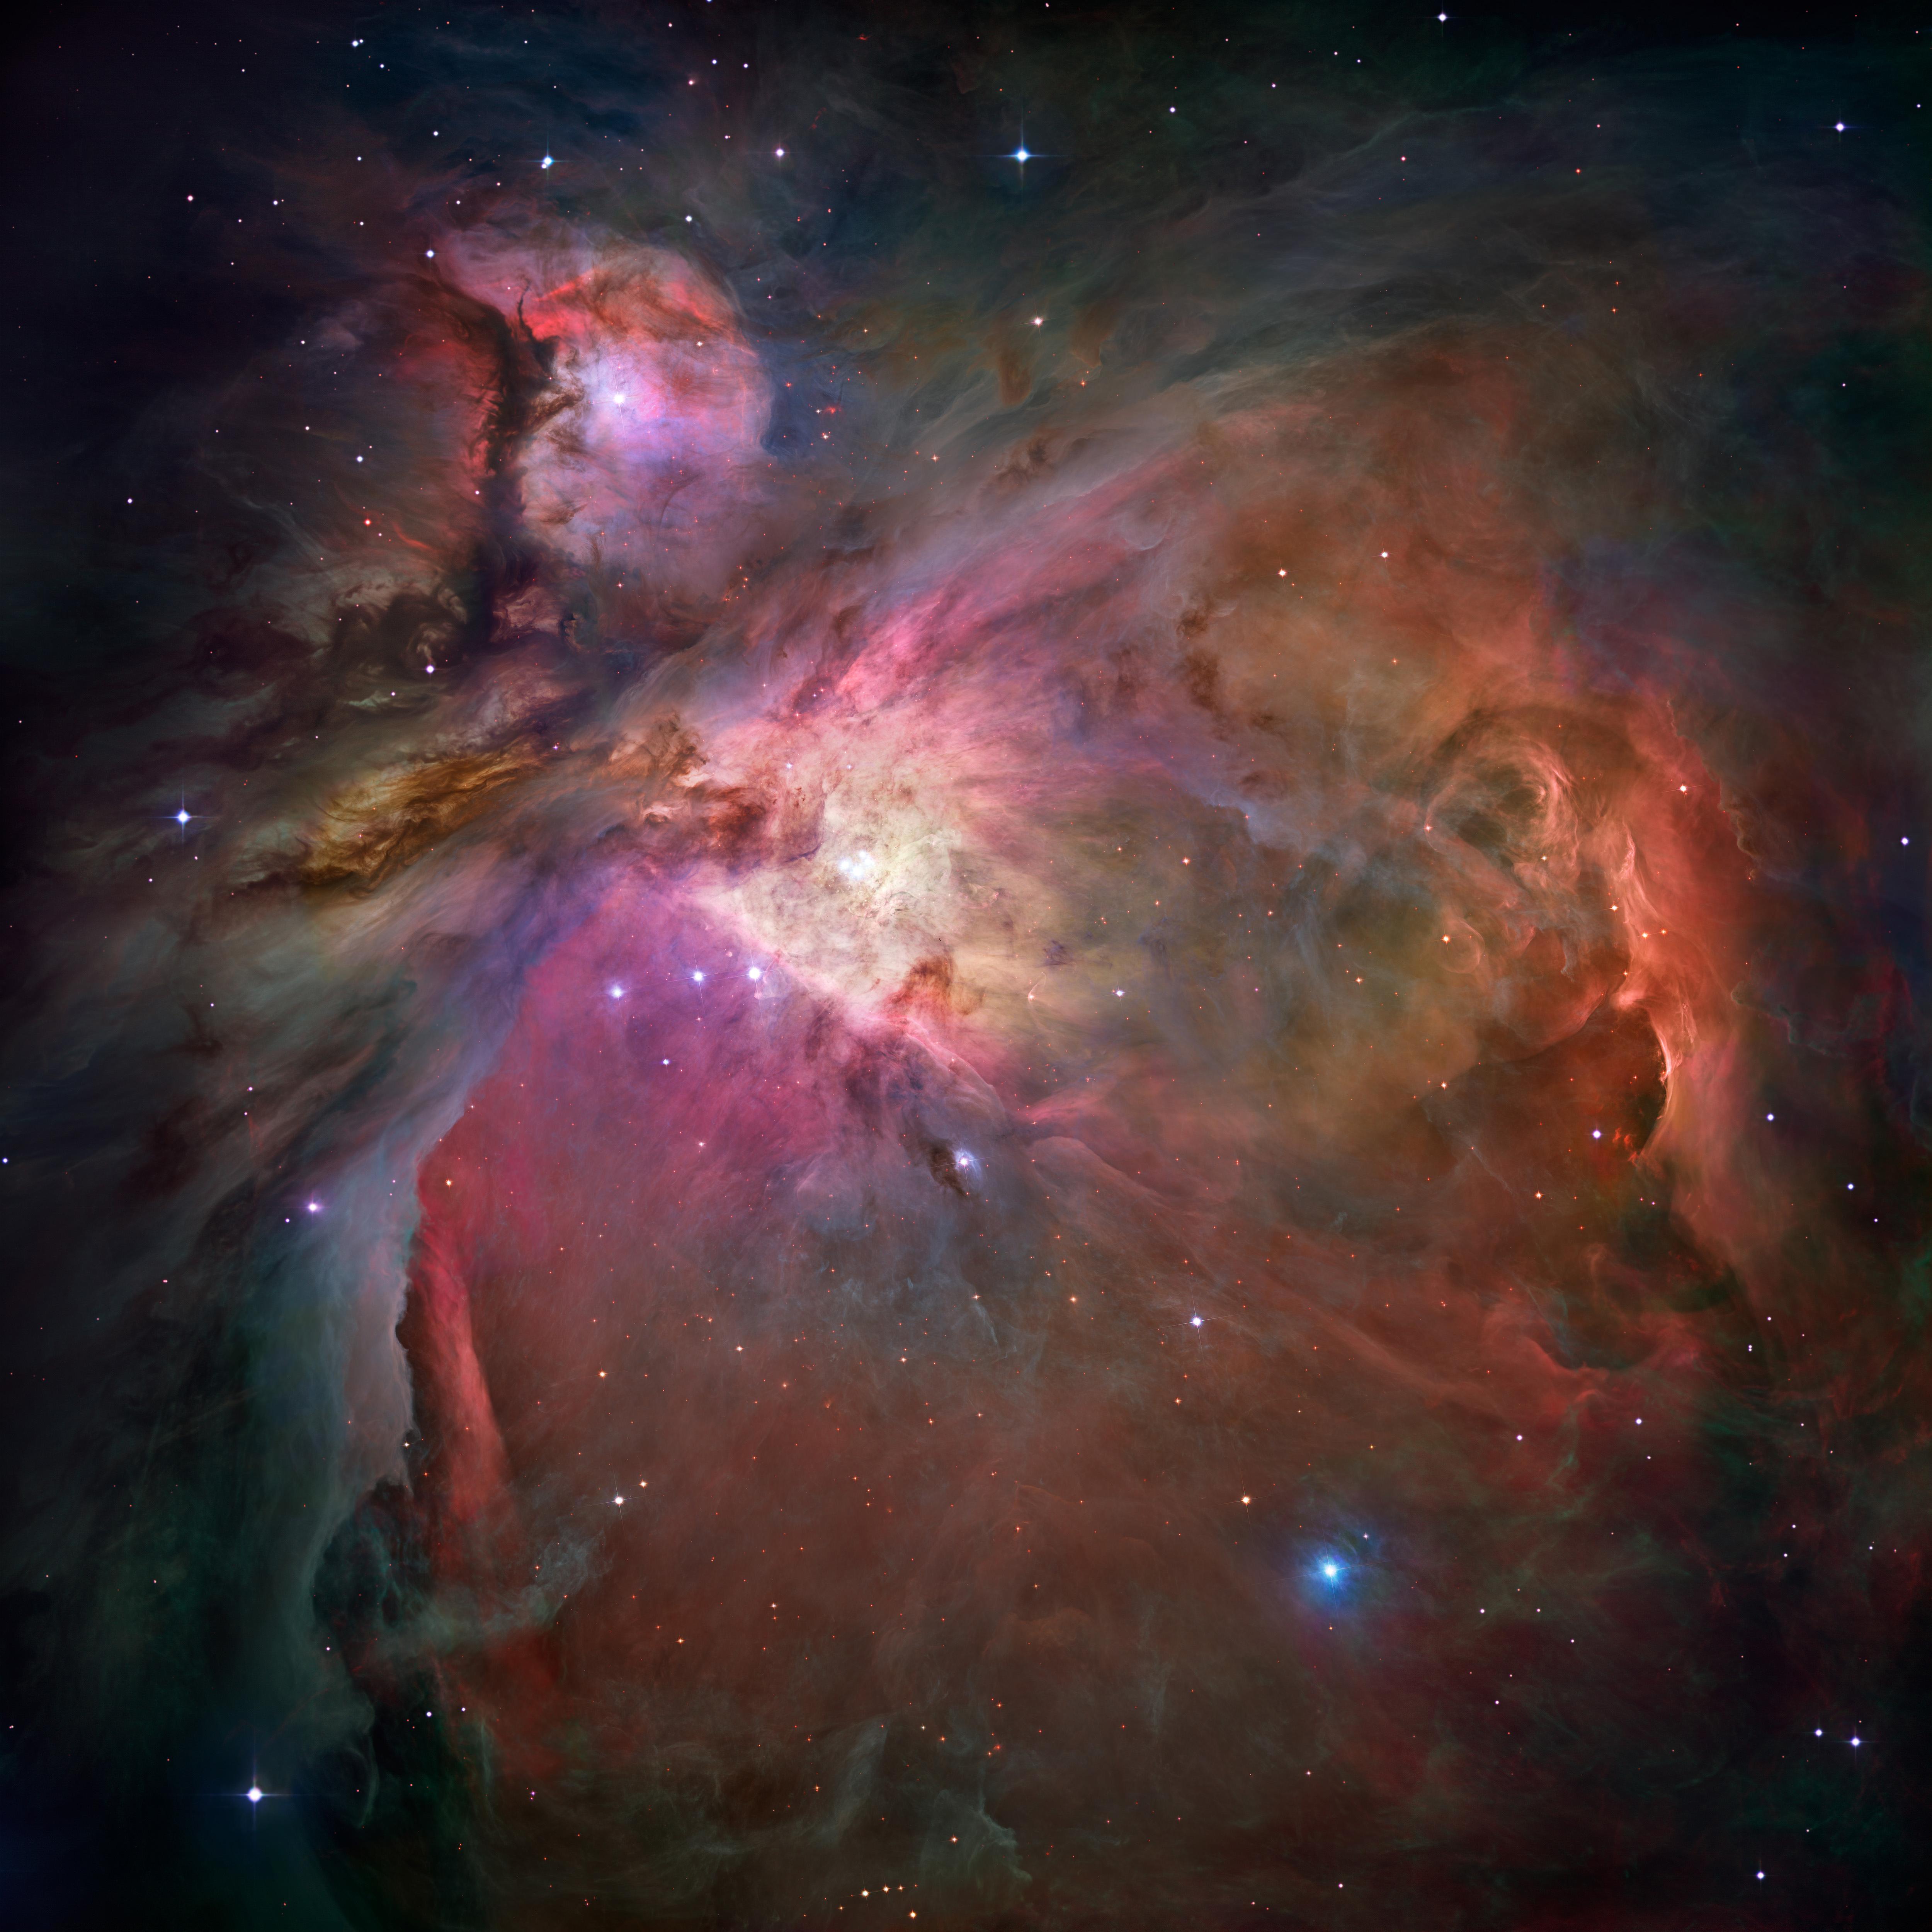 HUBBLE'S TOP 100 • #12 • Credit: NASA, ESA, M. Robberto (Space Telescope Science Institute/ESA) and the Hubble Space Telescope Orion Treasury Project Team